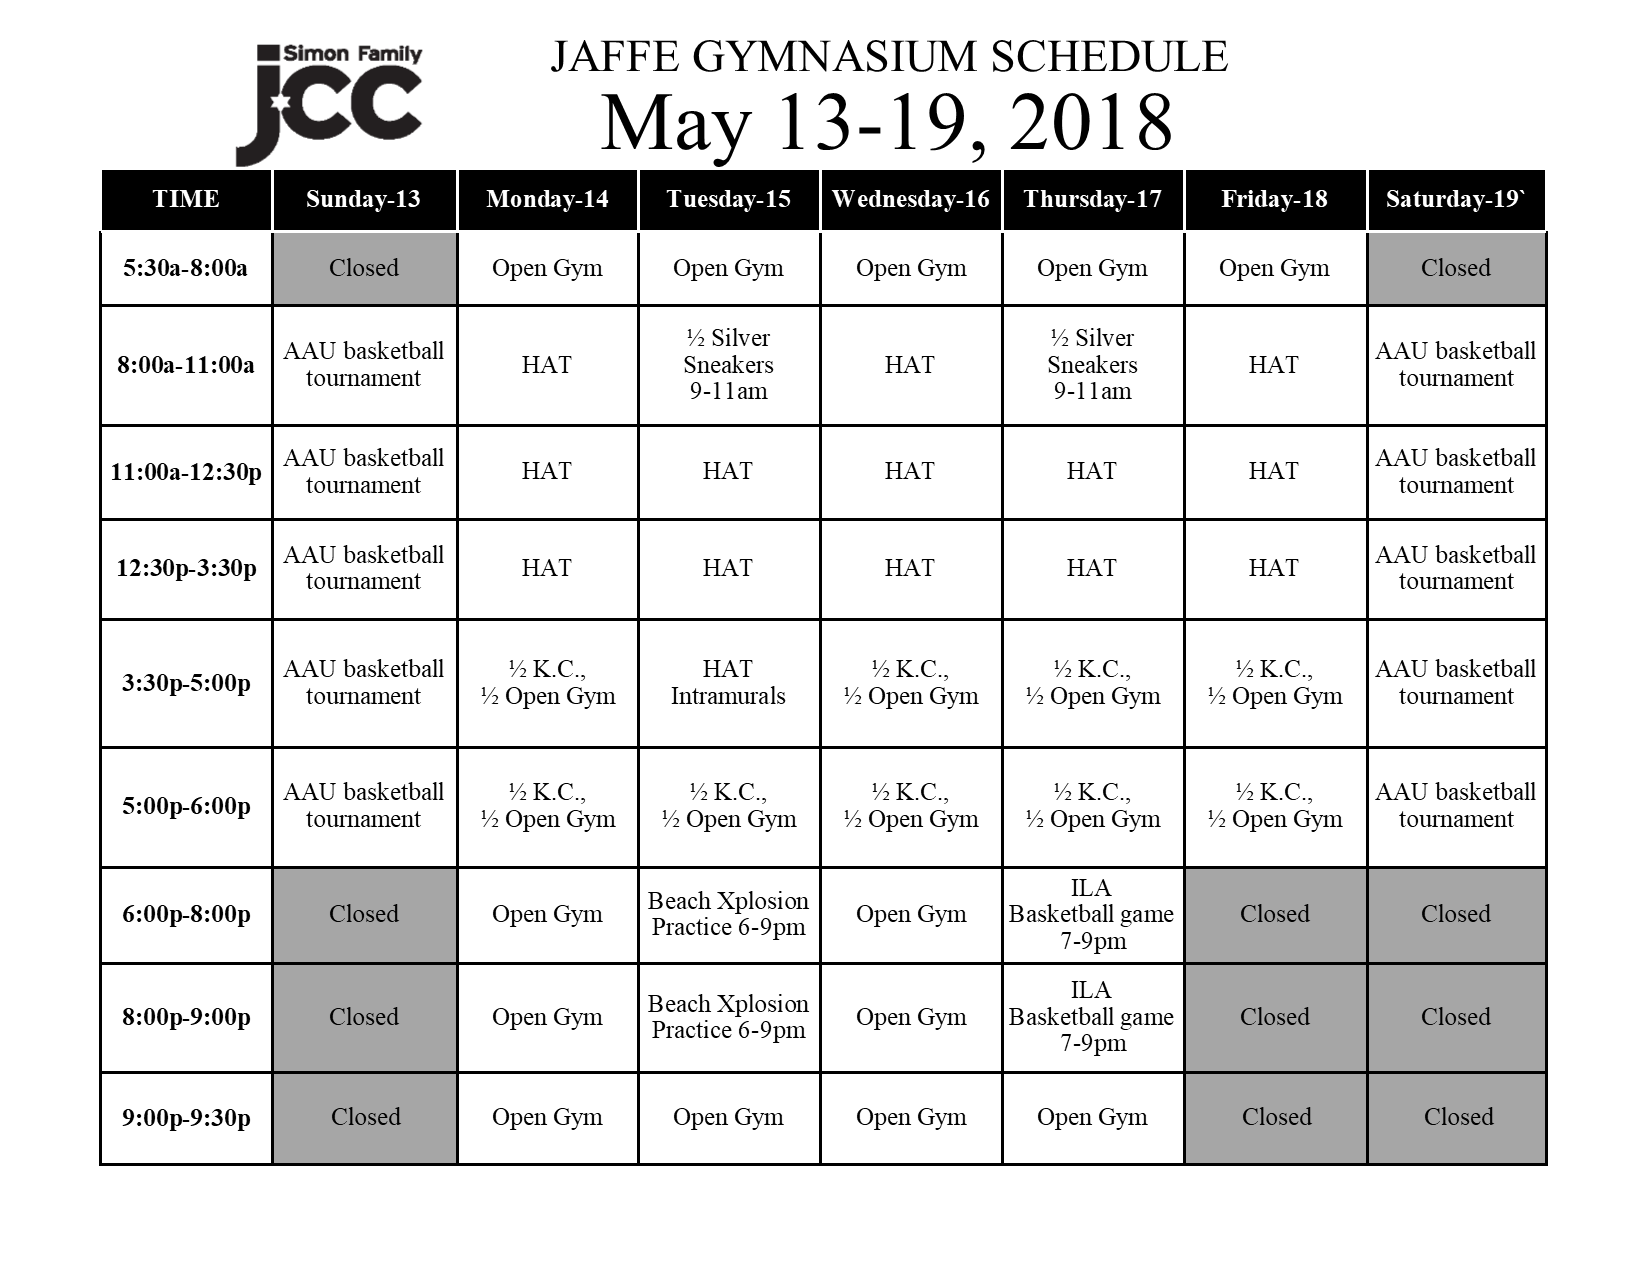 May 13-19 2018 Jaffe Gym Schedule